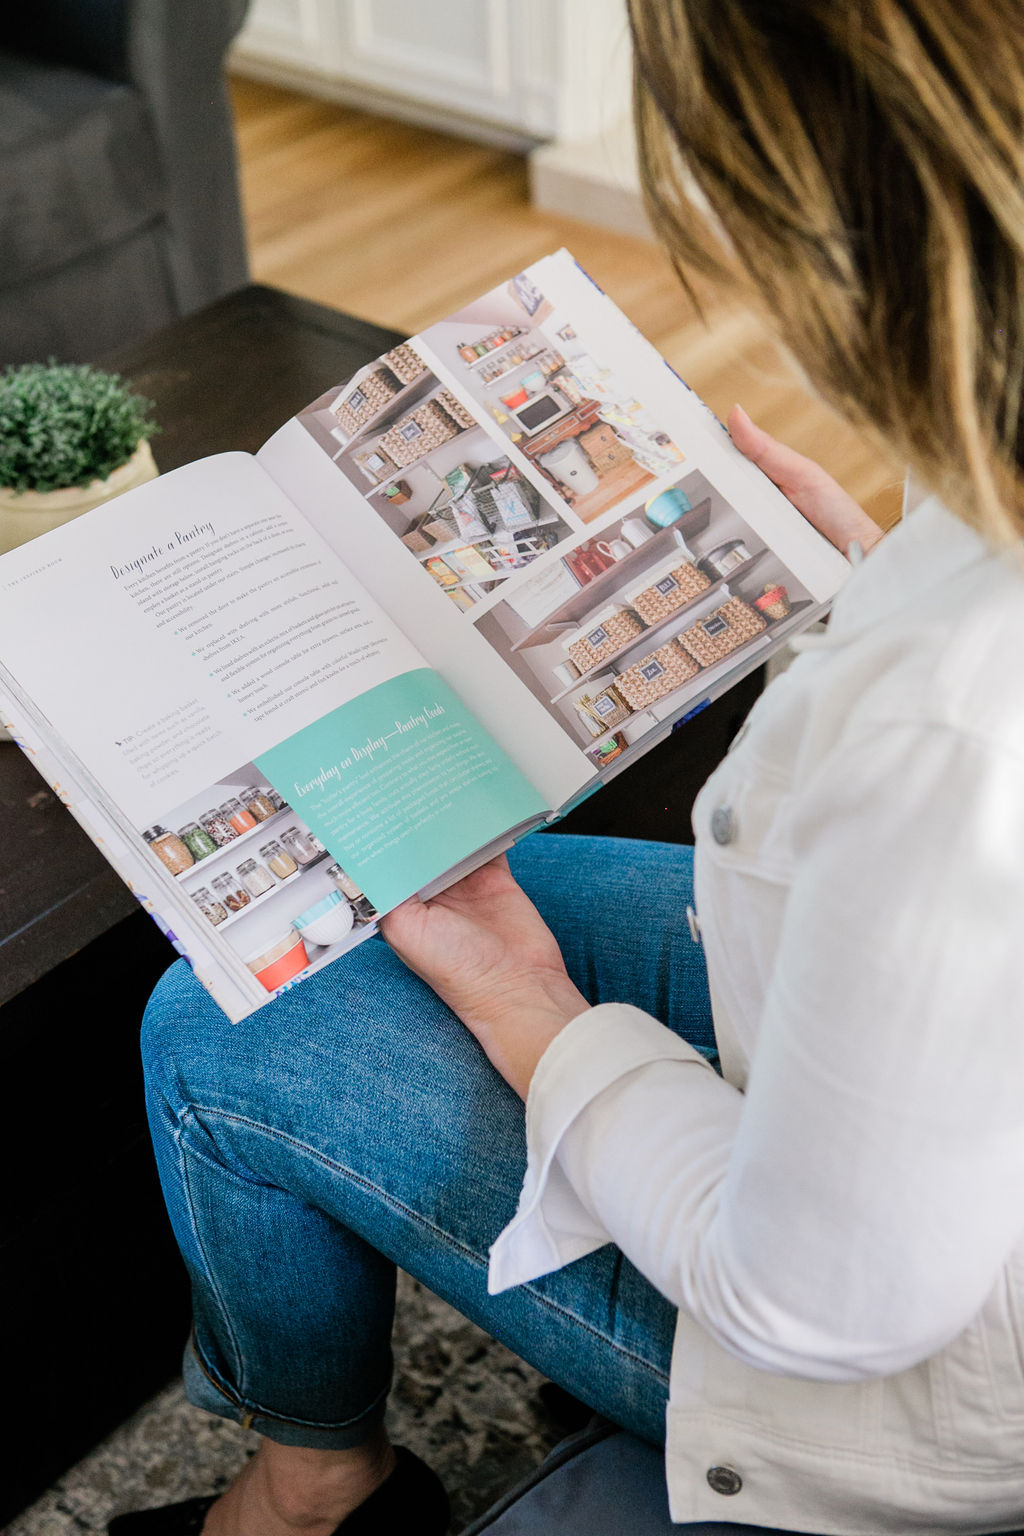 Sherri Monte, an interior designer and home organizer reading an organizing ideas magazine.